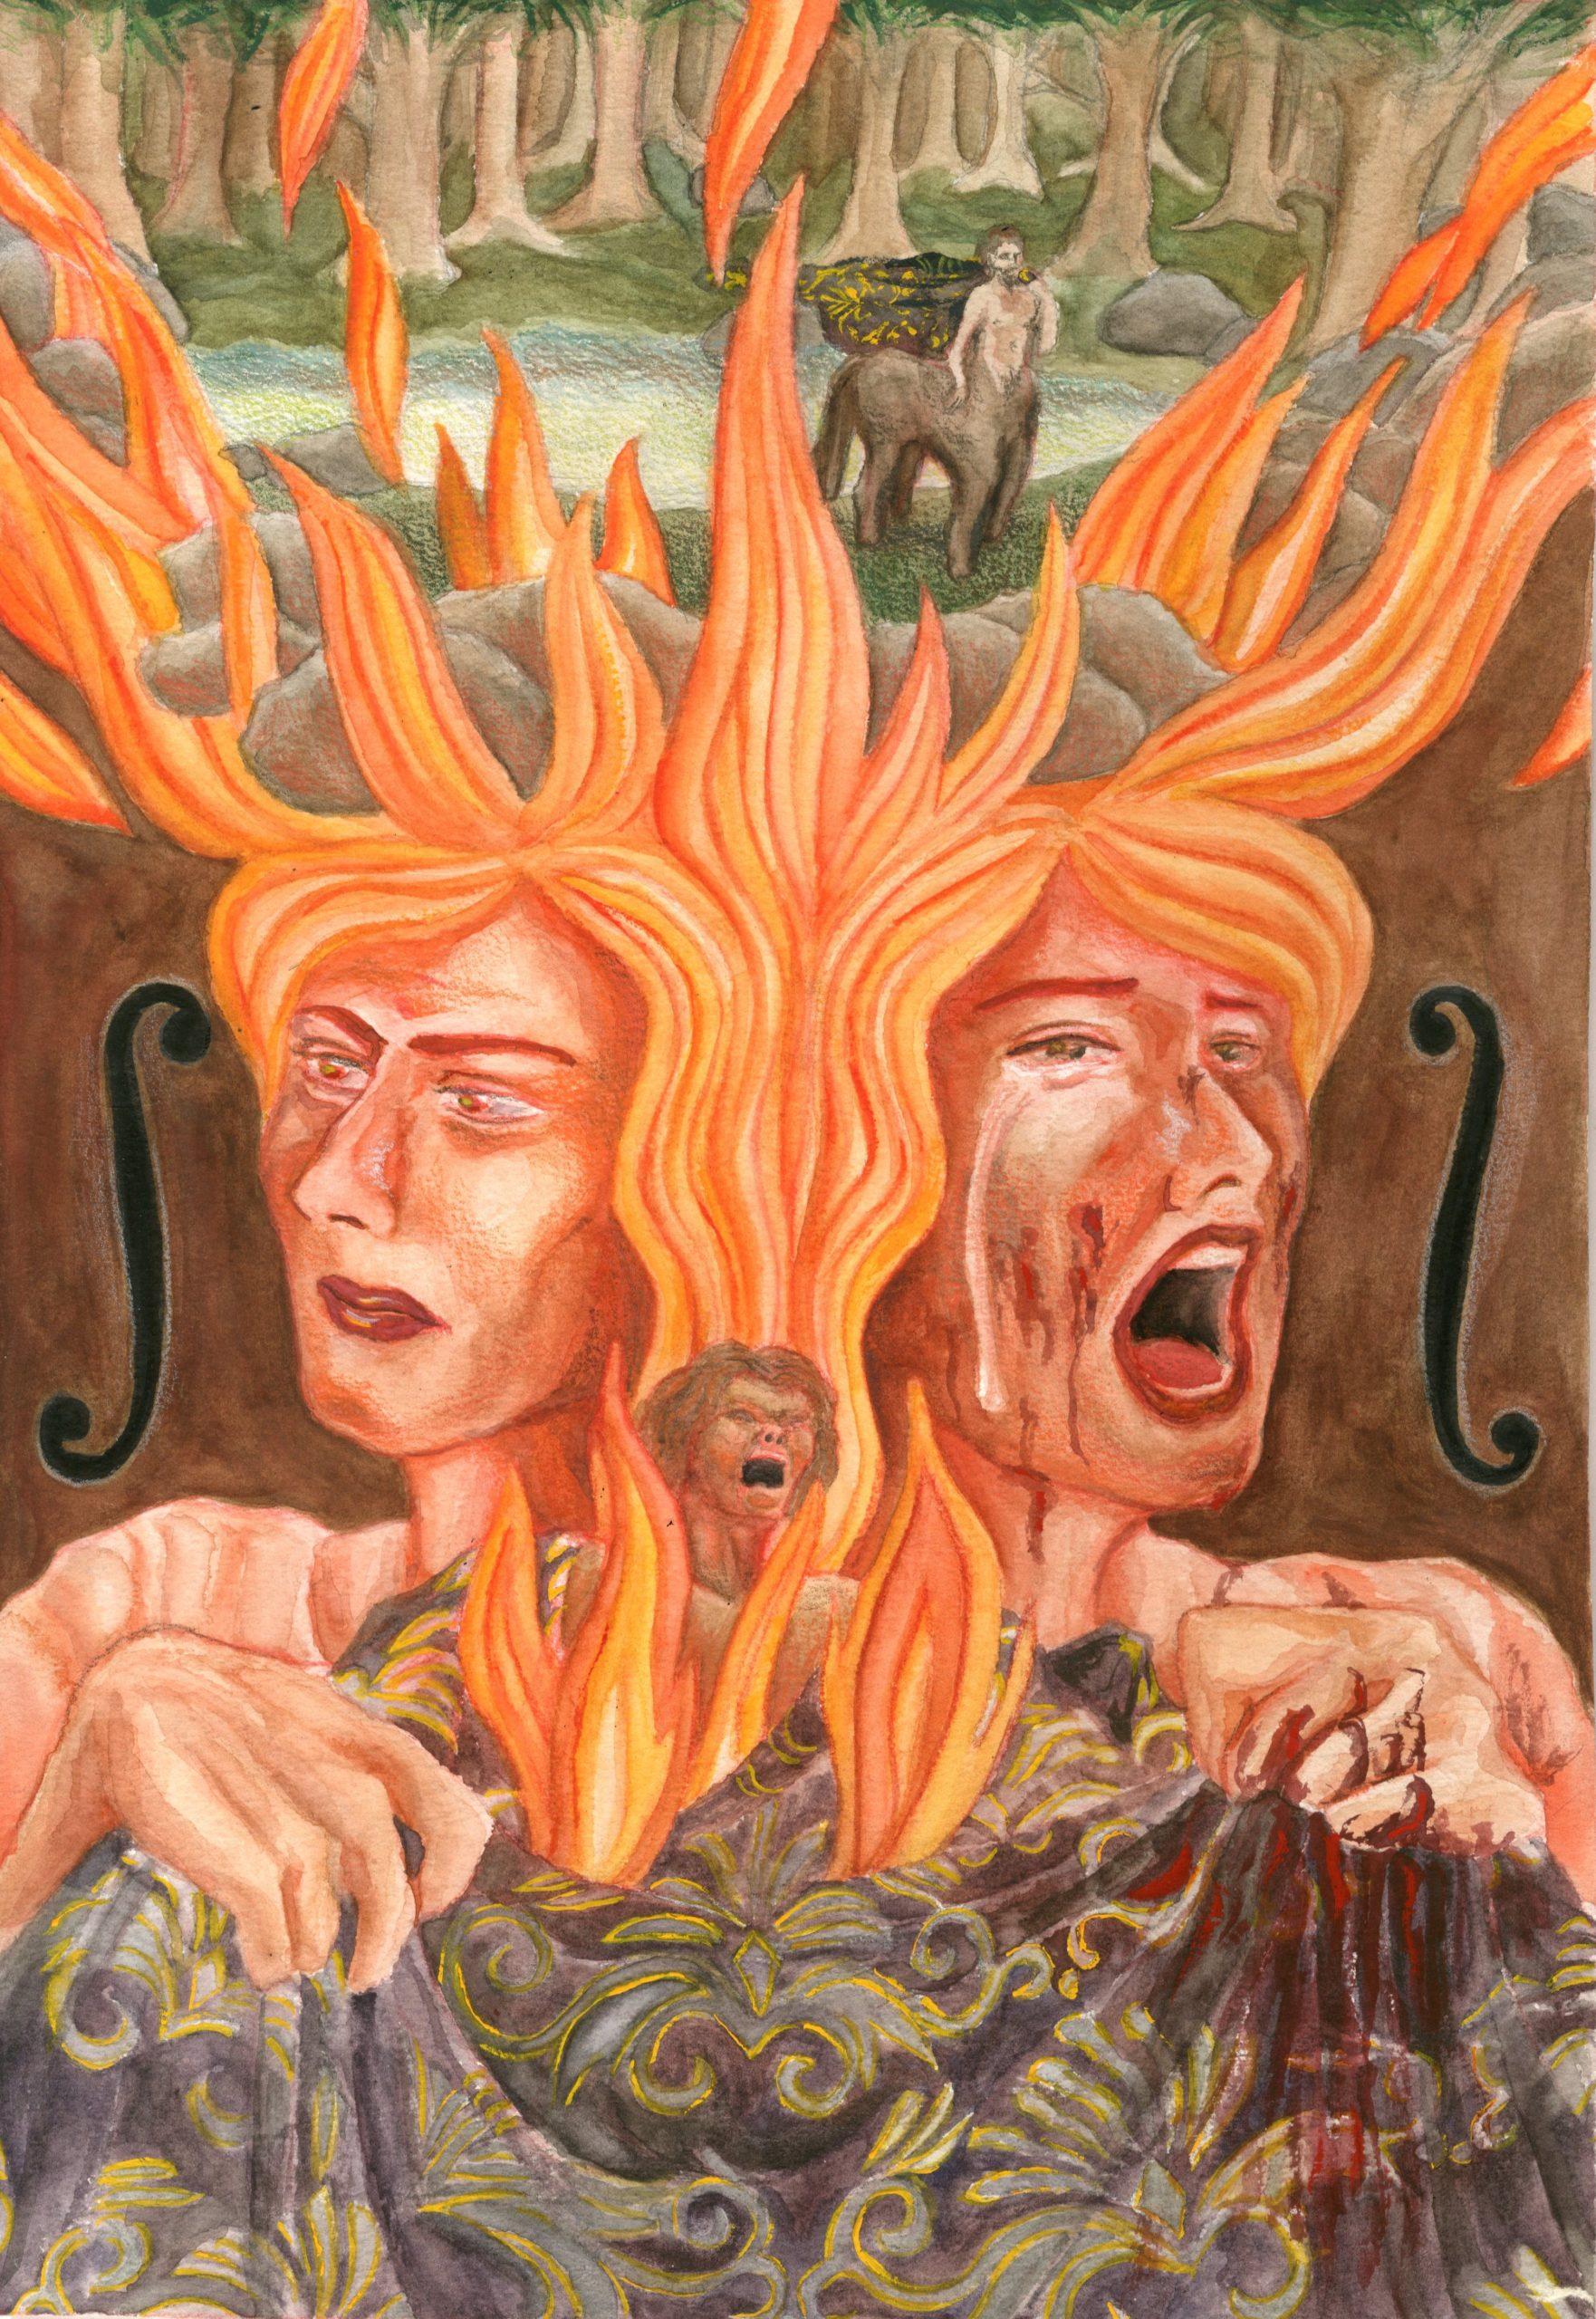 Hercules student artwork from MassArt, Sim